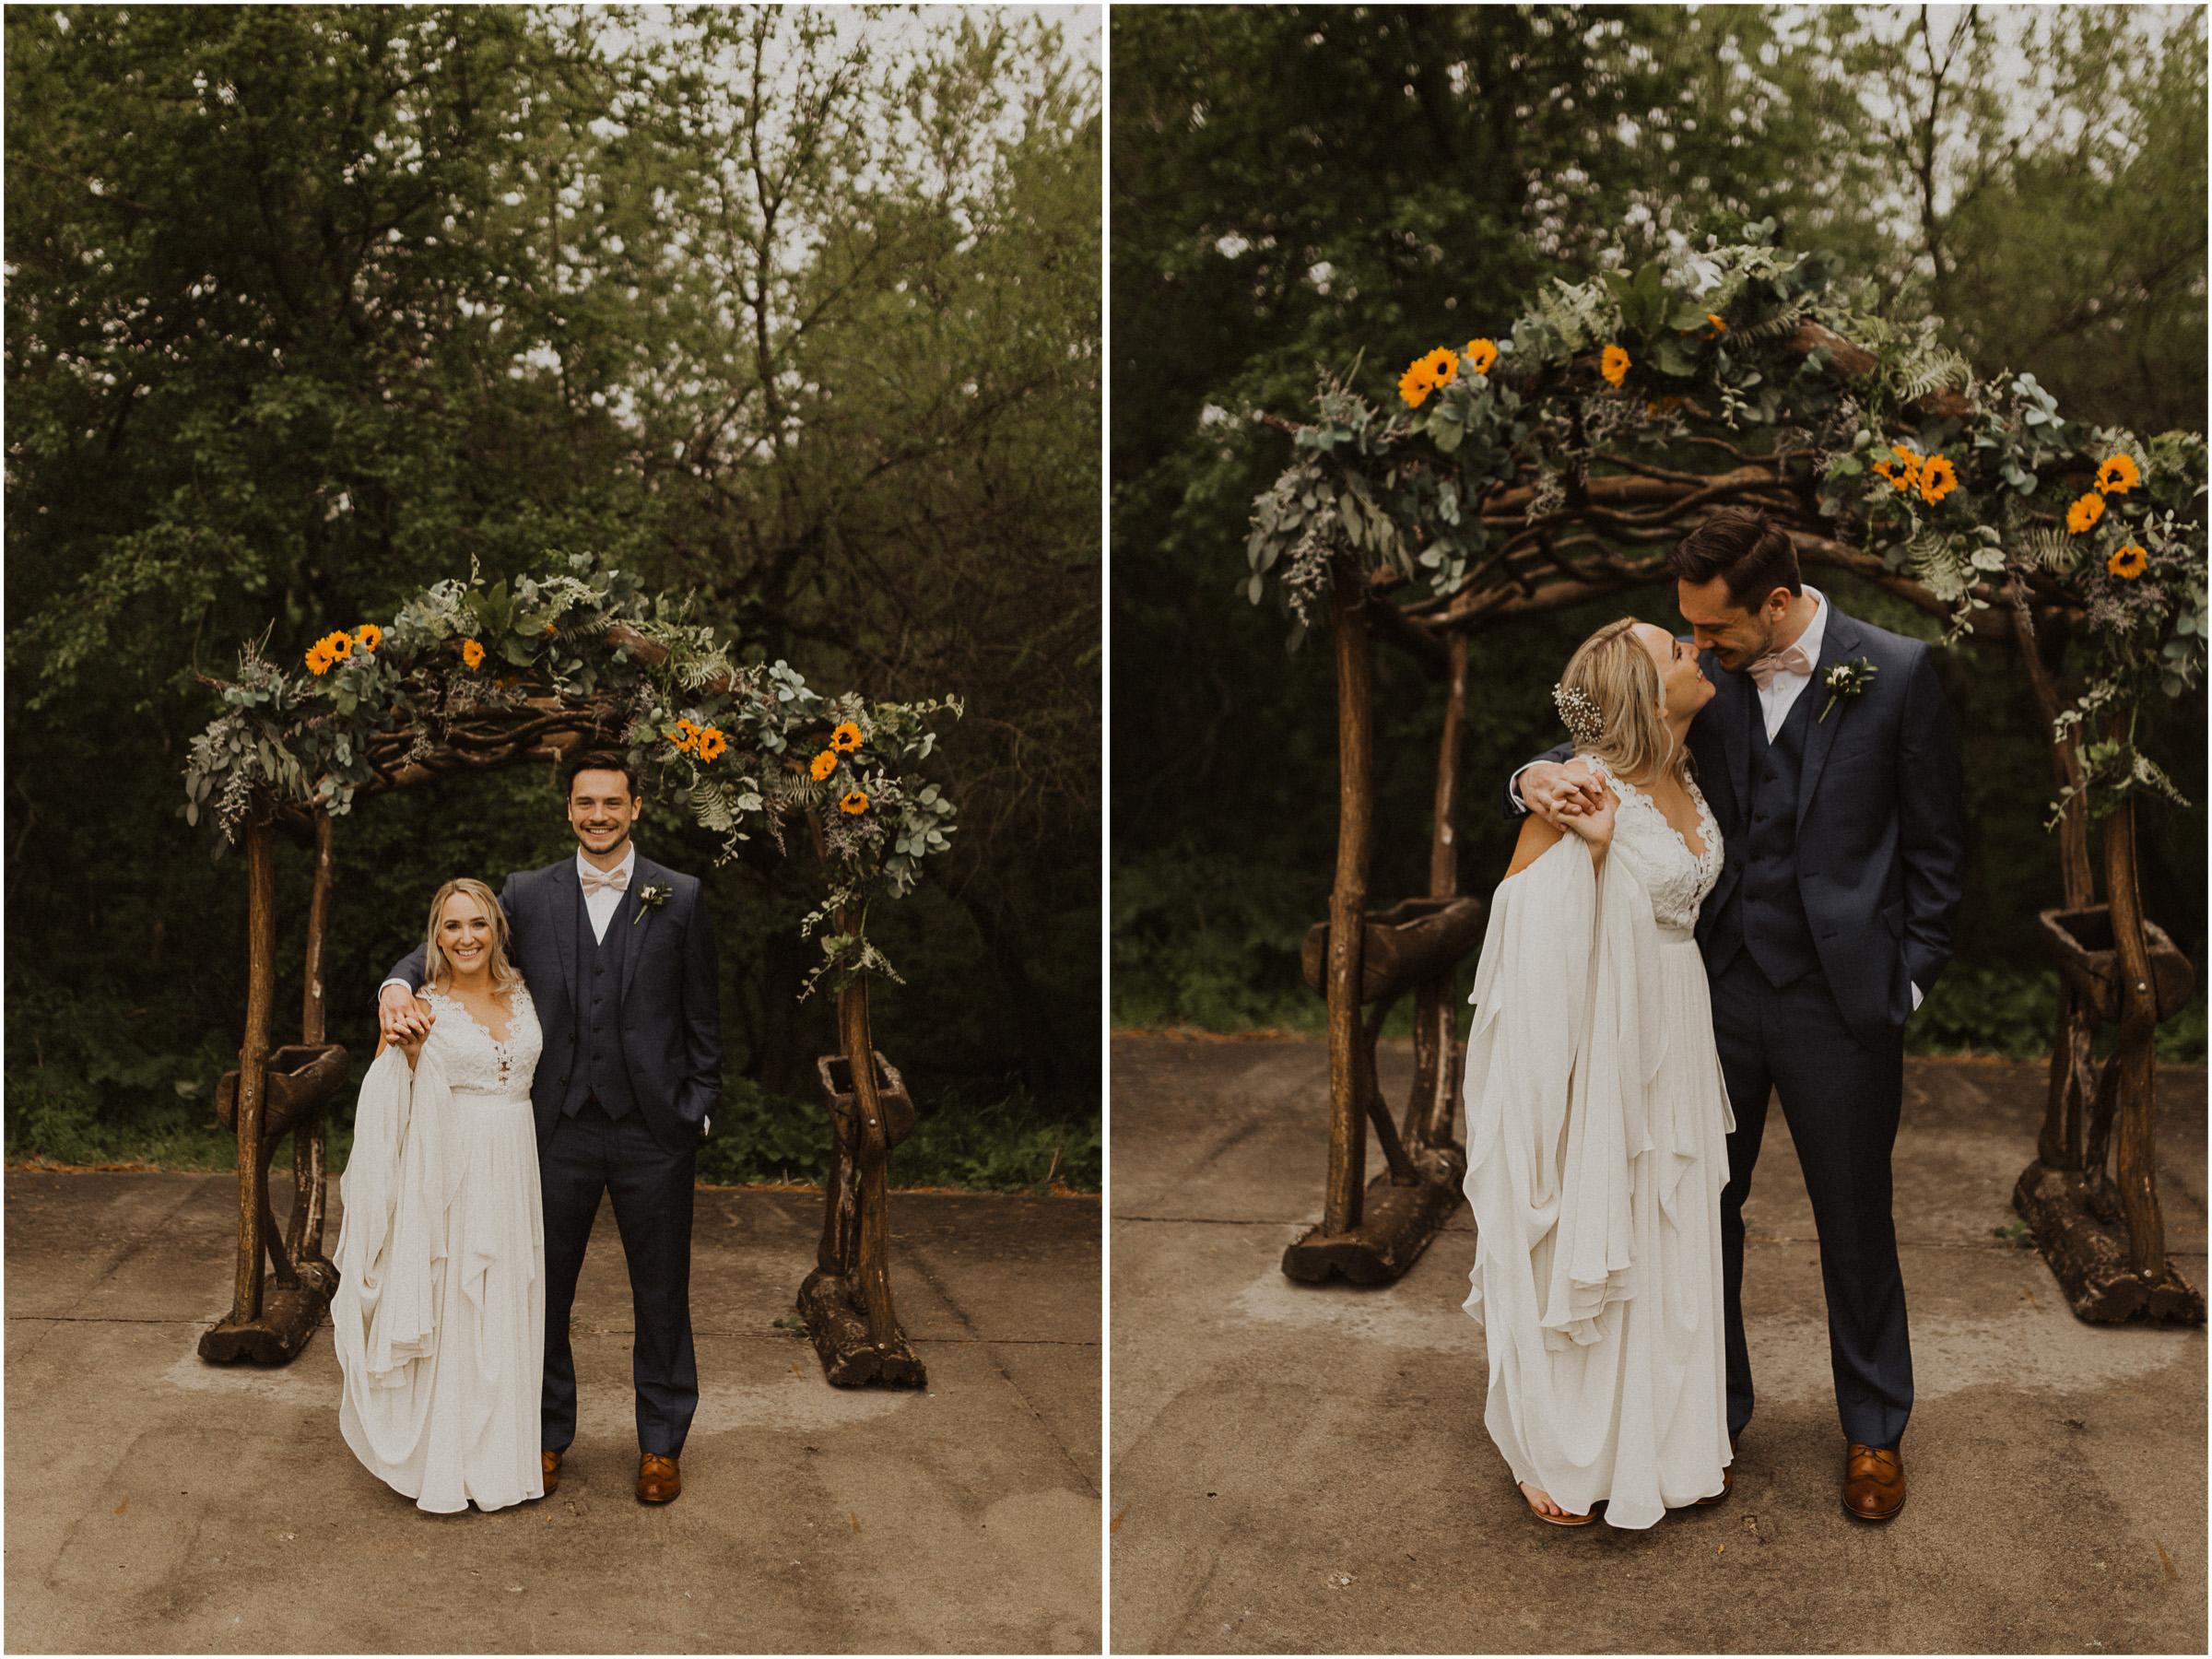 alyssa barletter photography nelson wedding nebraska city lied lodge morton barn spring wedding photographer-26.jpg